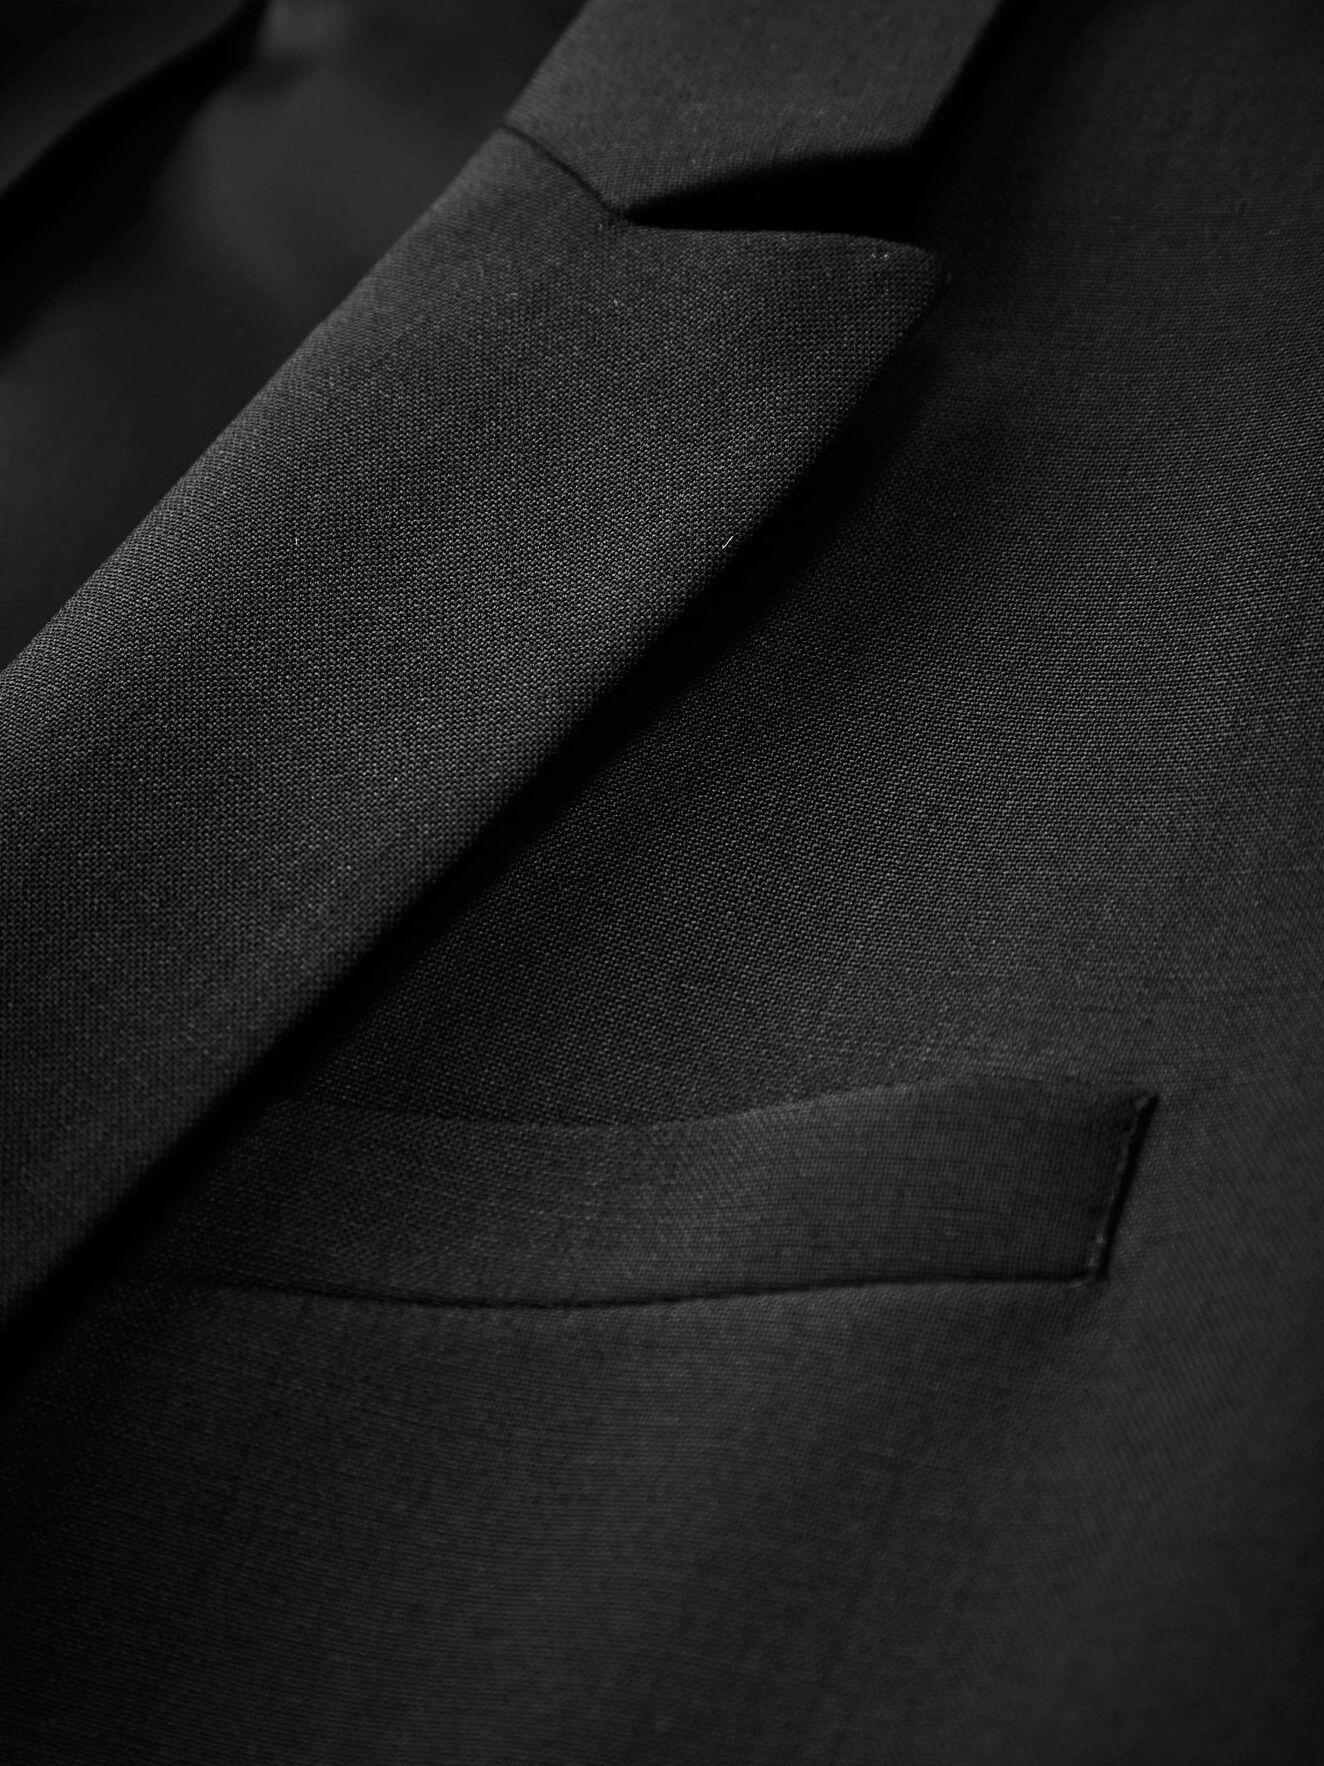 Olita blazer in Black from Tiger of Sweden